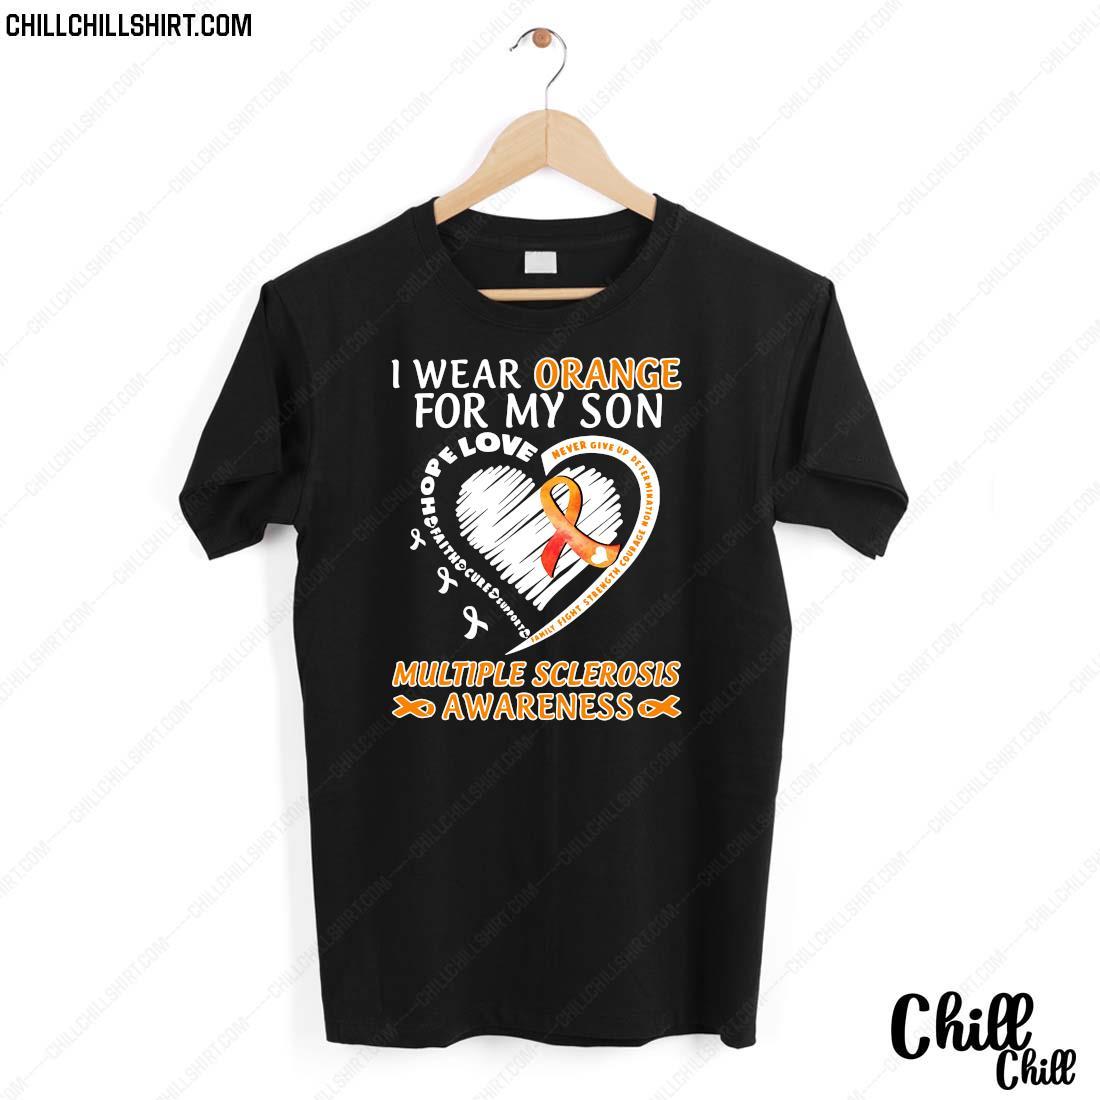 I Wear Orange For My Son Multiple Sclerosis Awareness Shirt